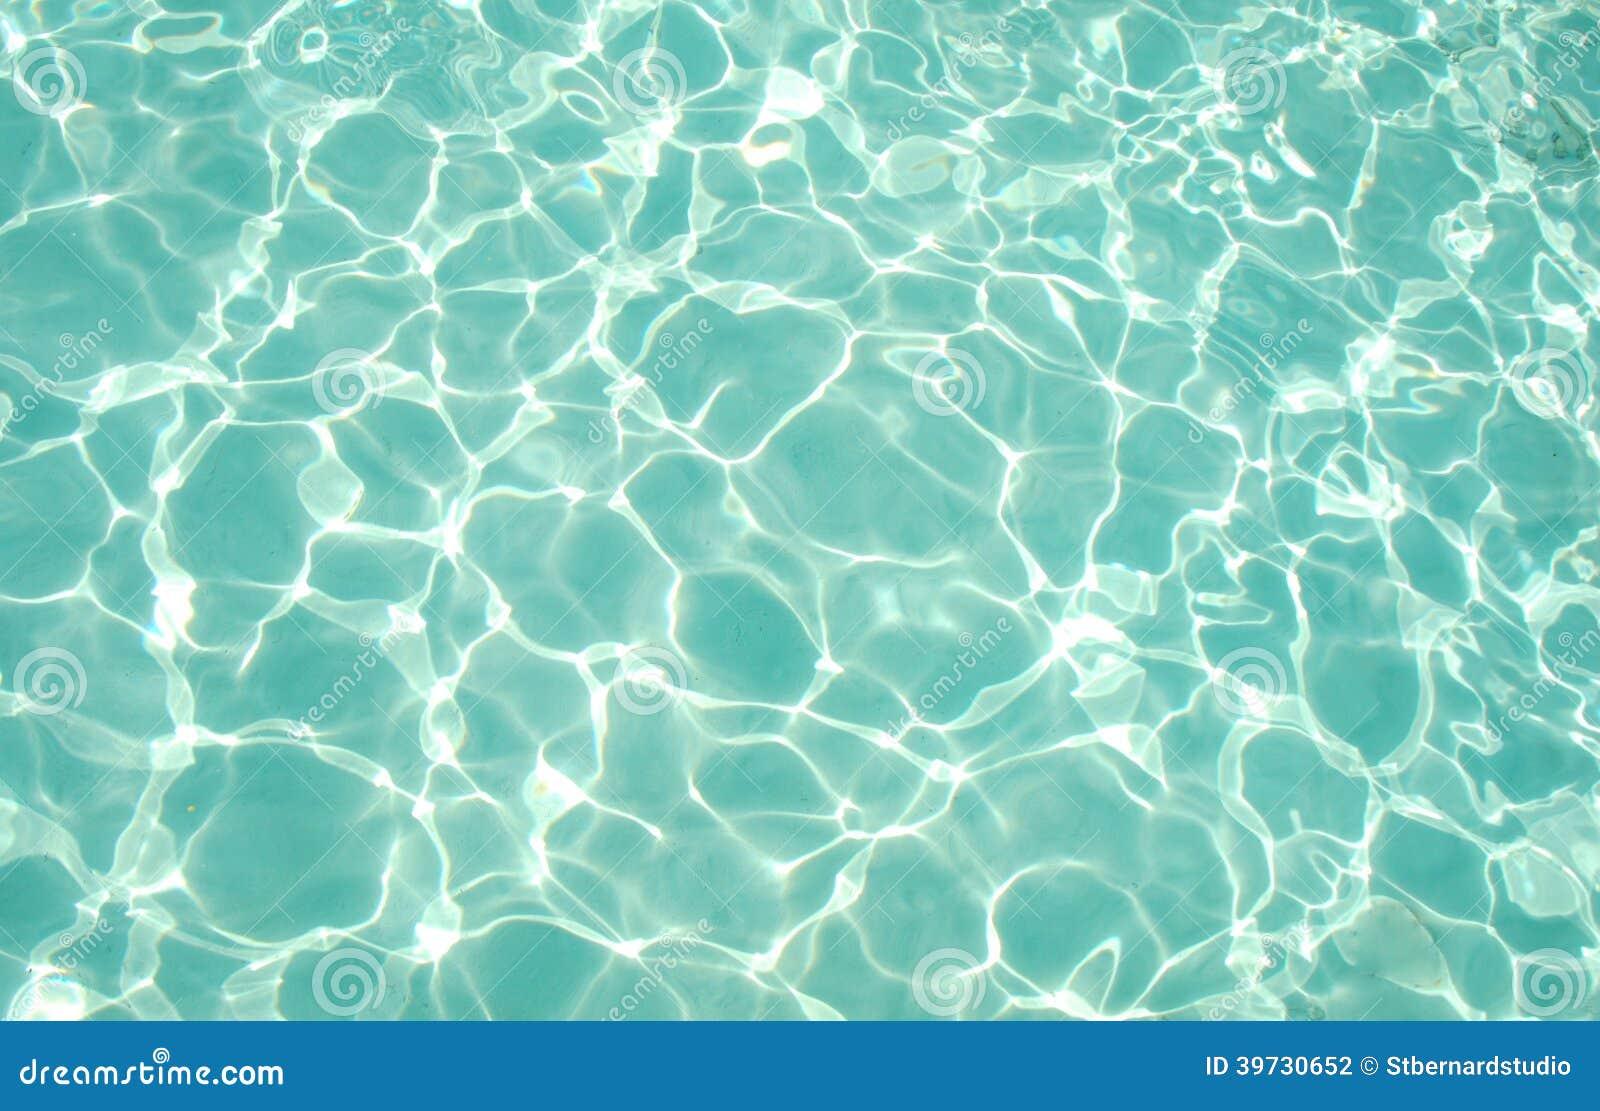 Texture of Light Blue Green Sea Water around Atoll